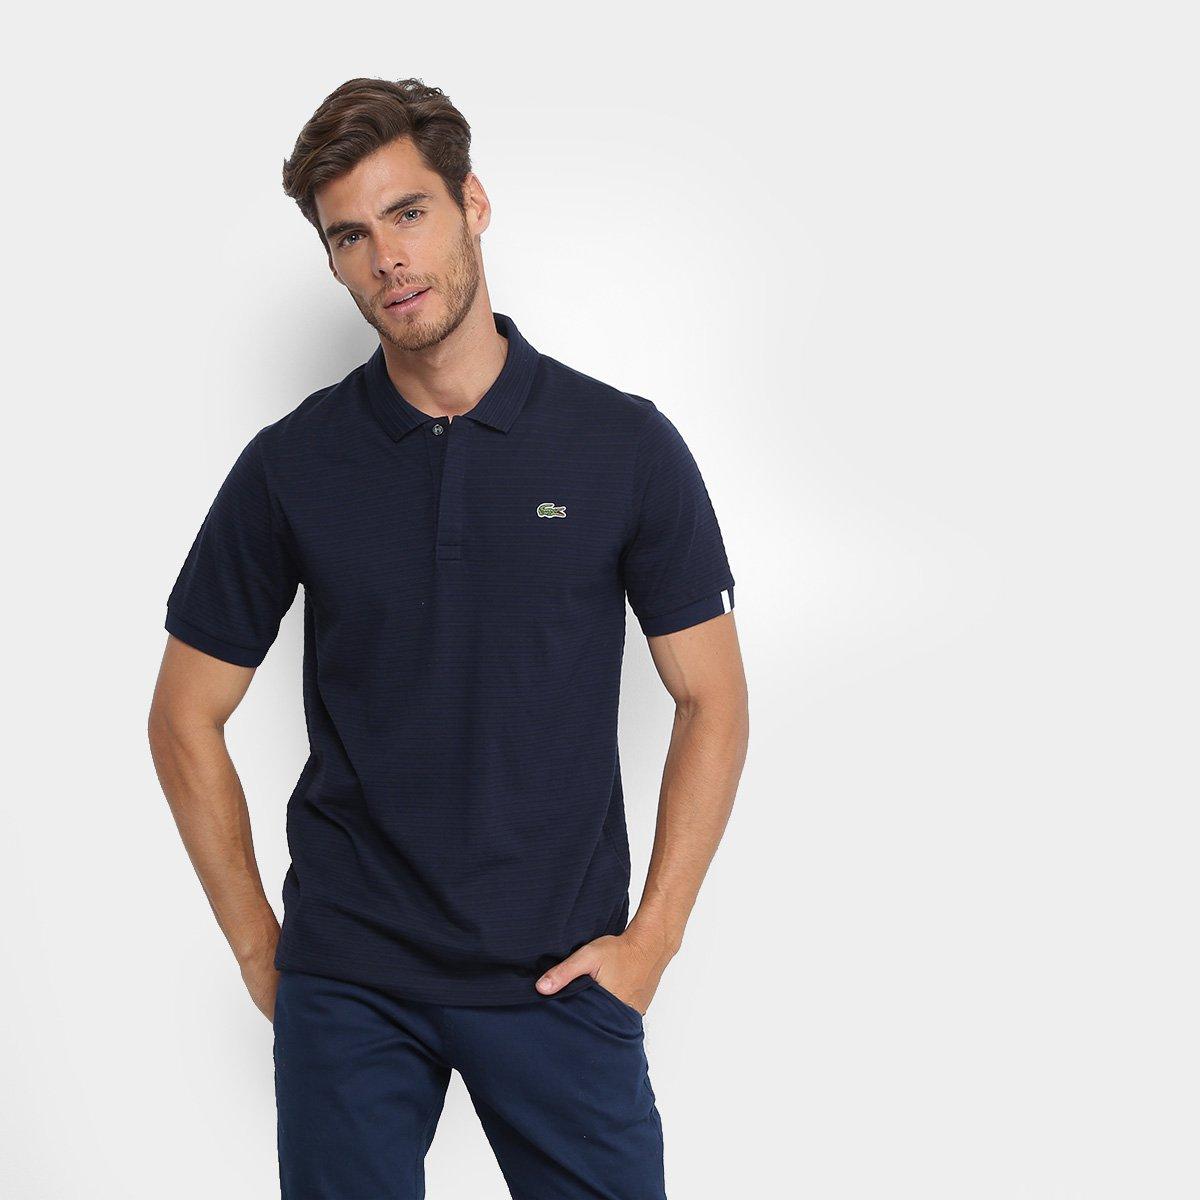 Foto 1 - Camisa Polo Lacoste Live Malha Textura Masculina